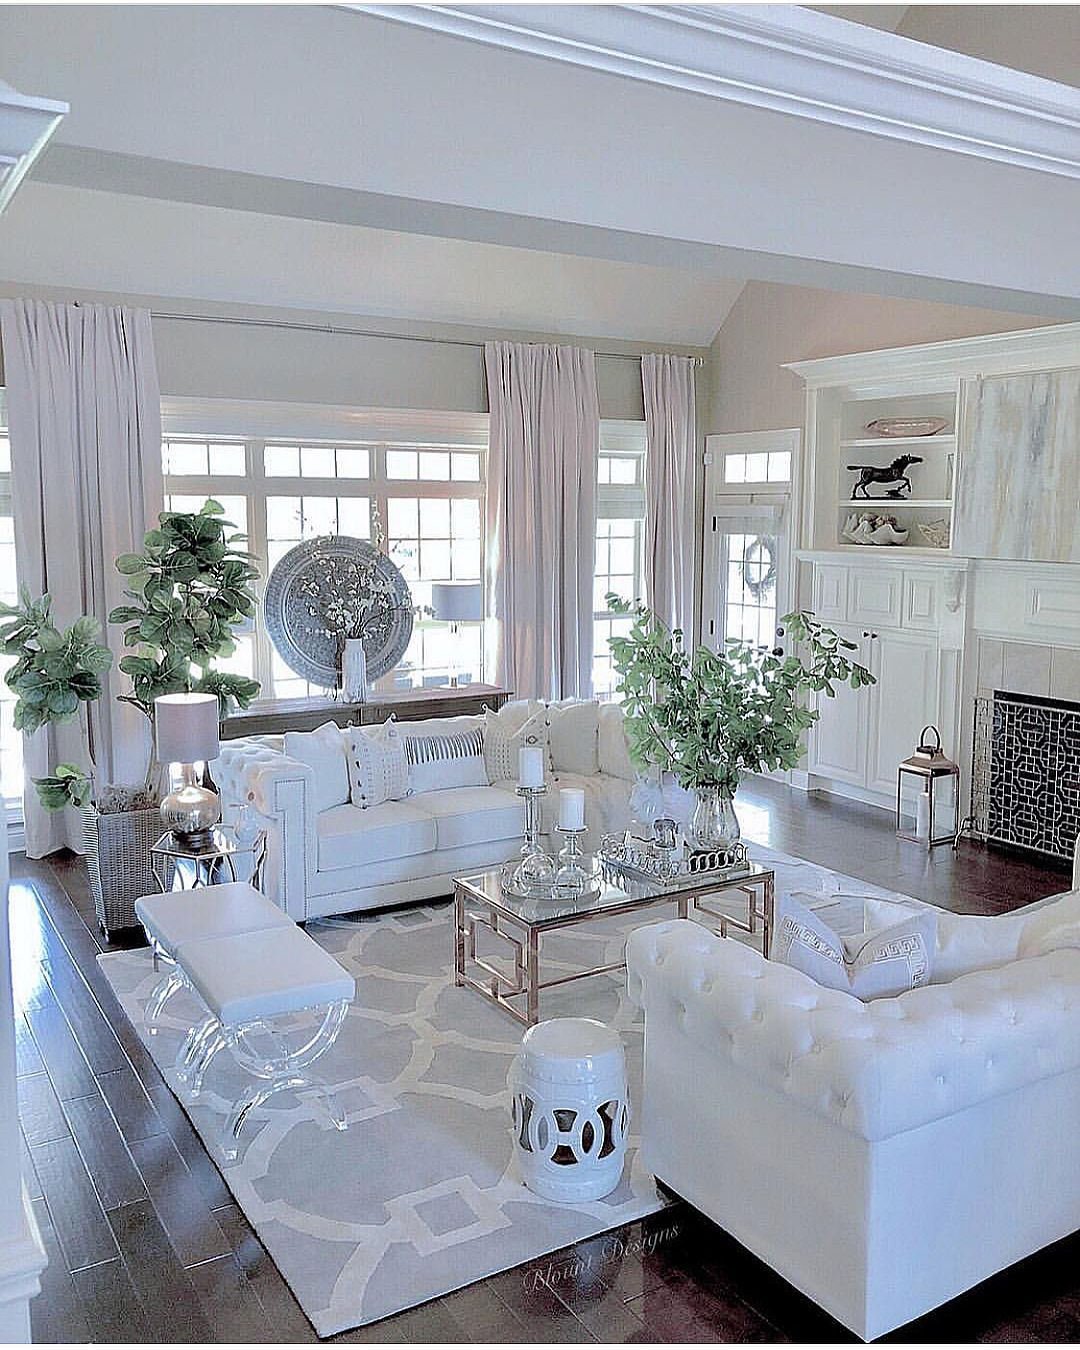 Inspire Me Home Decor Living Room In 2020 Living Room Designs Inspire Me Home Decor Glam Living Room